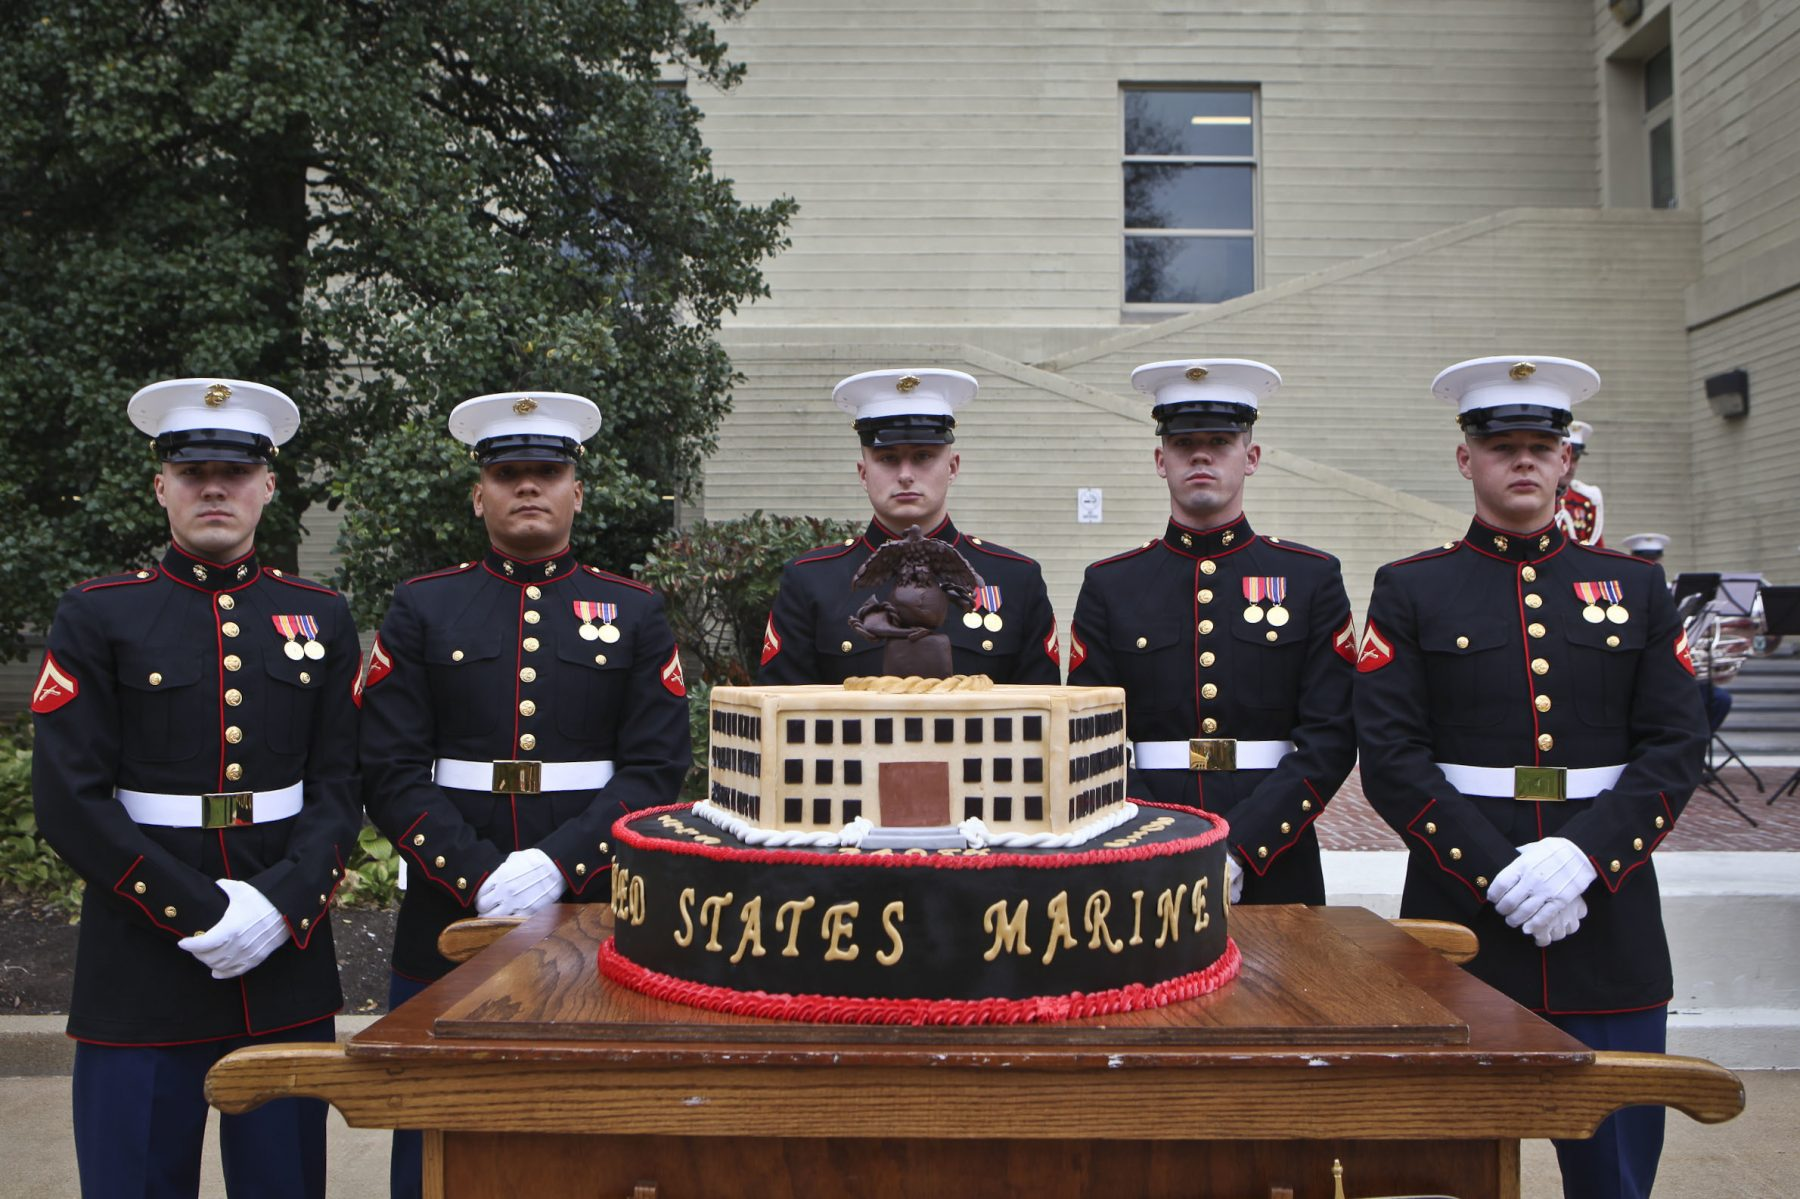 sarasota county veterans marine corps near me